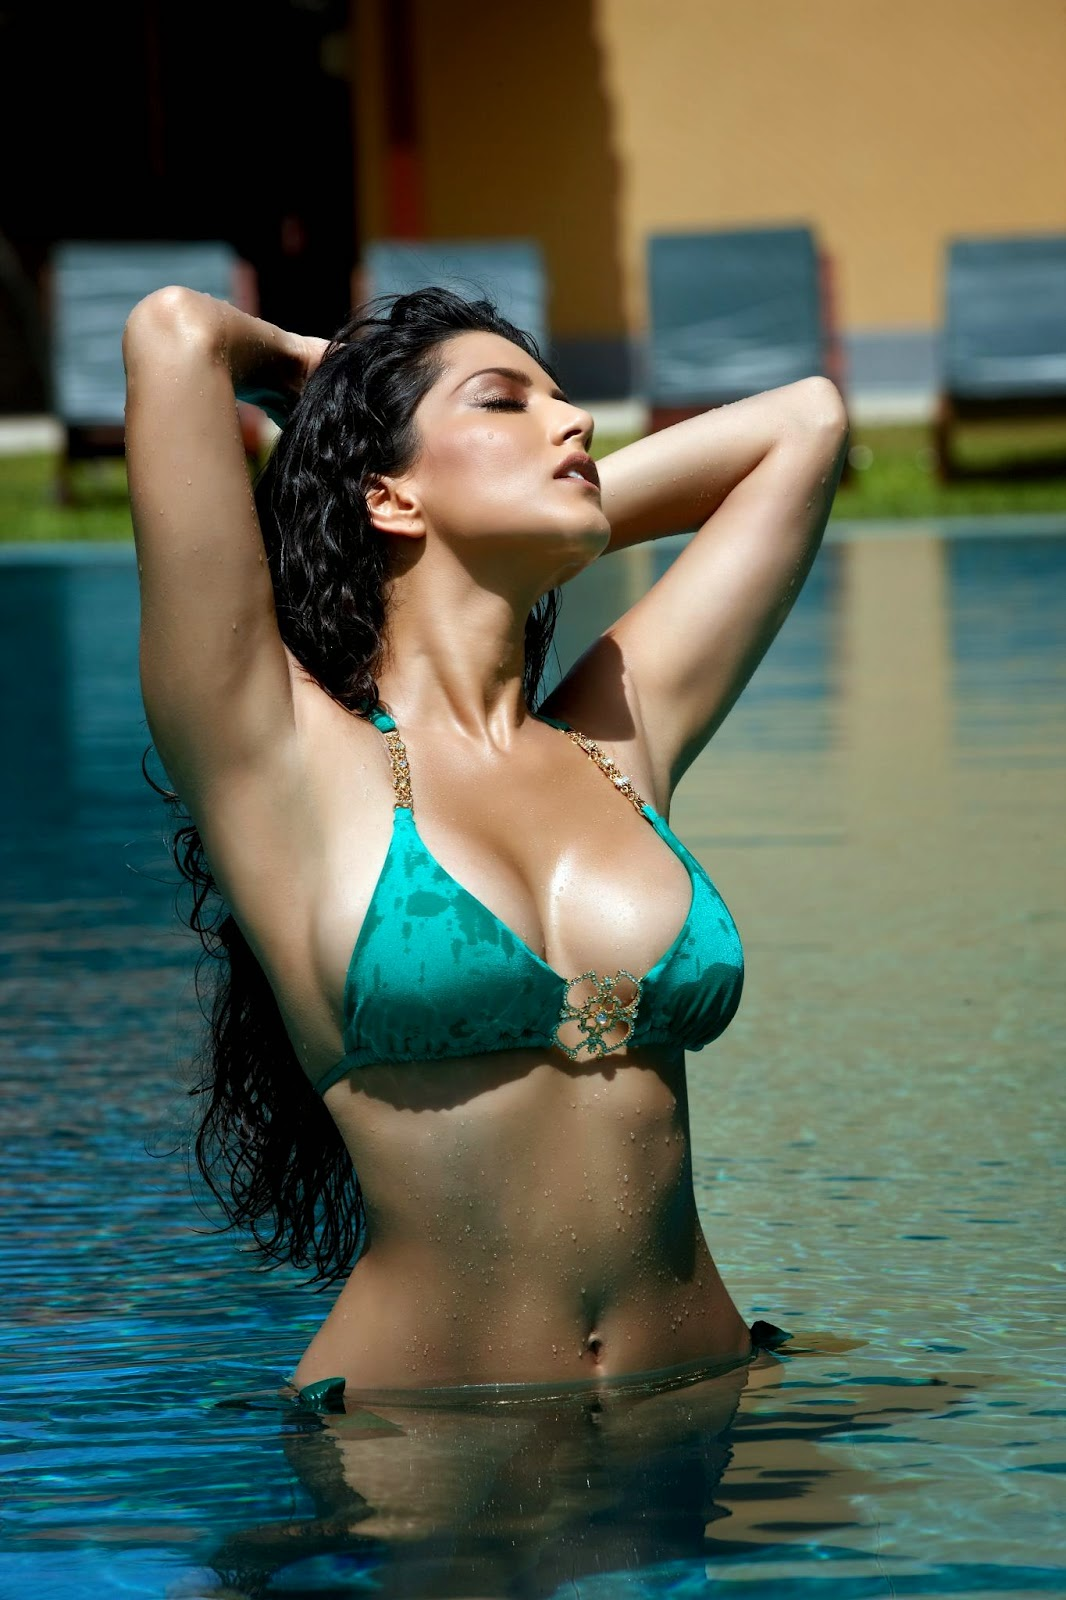 Sunny leone xx shoot for imbesharamcom - 1 2